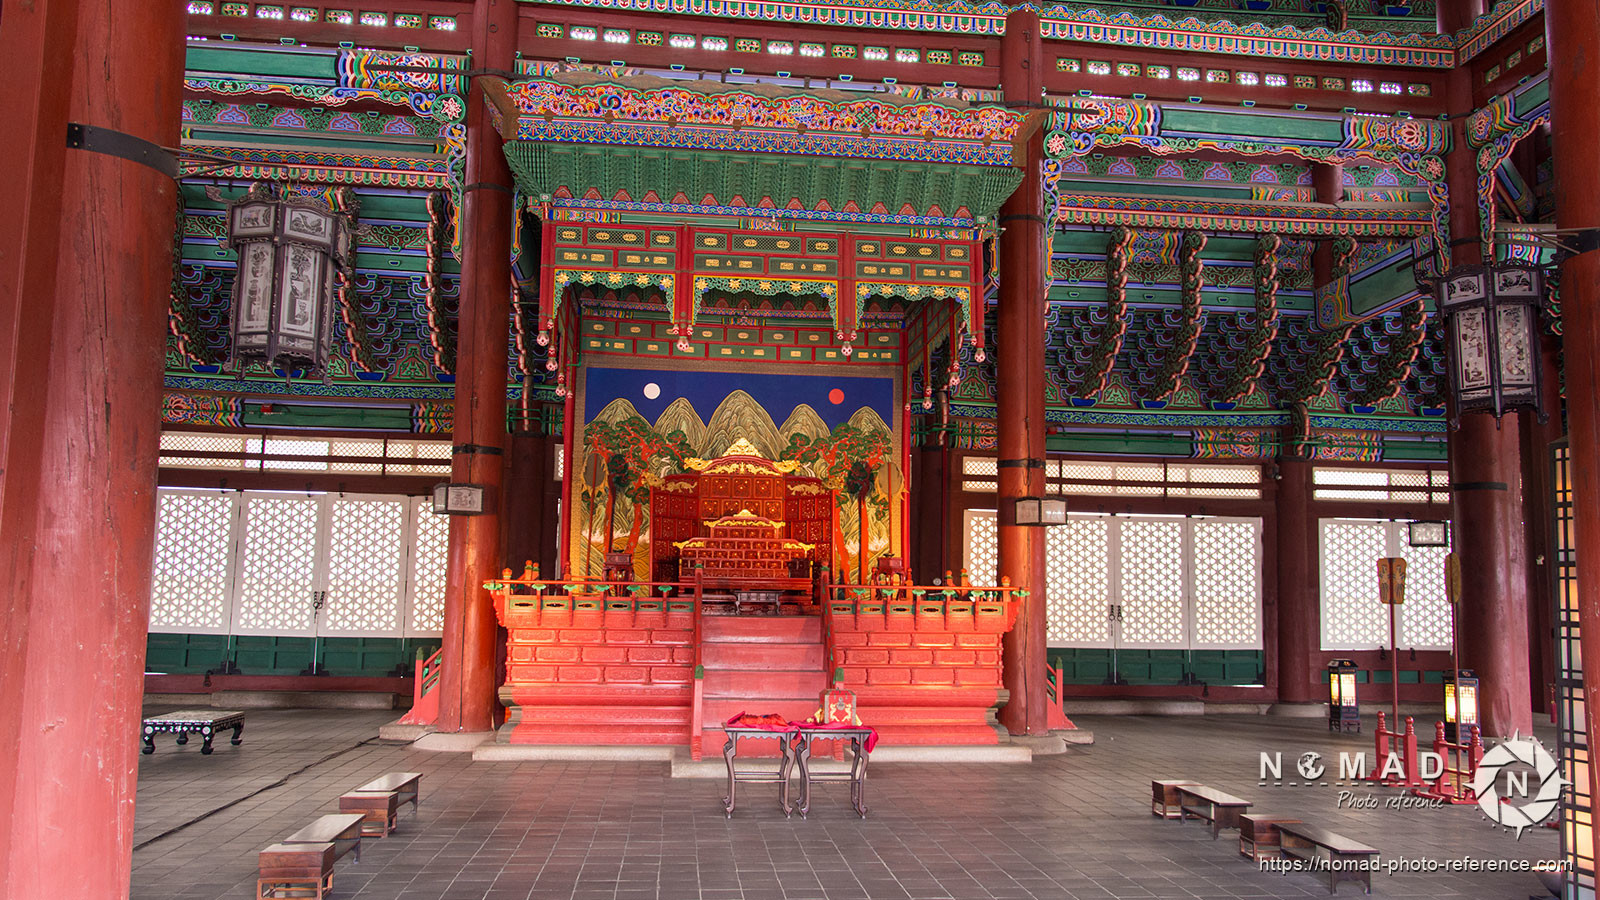 Photo reference pack gyeongbokgung palace 14